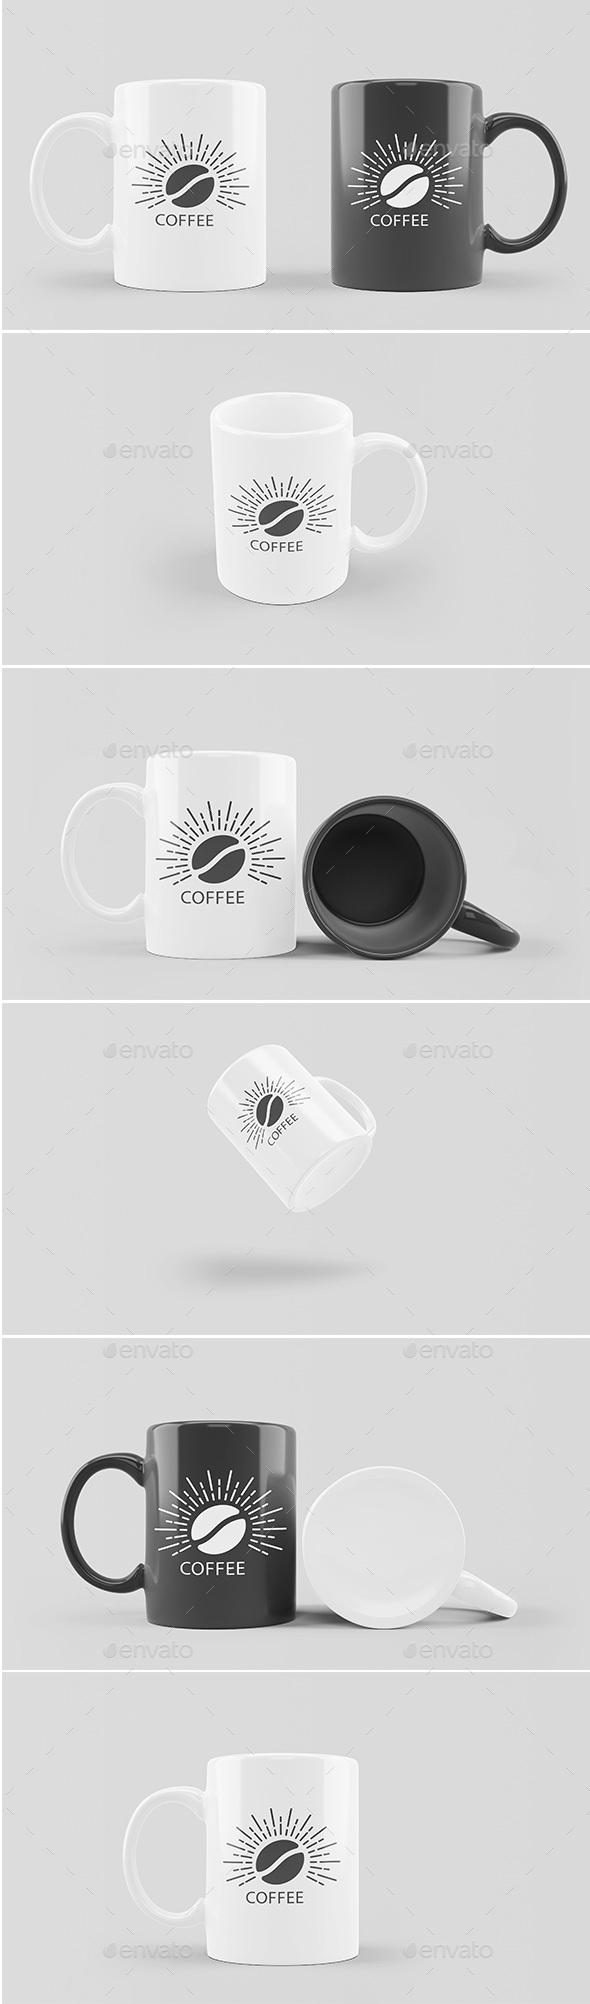 GraphicRiver Mug Mockups 20372315